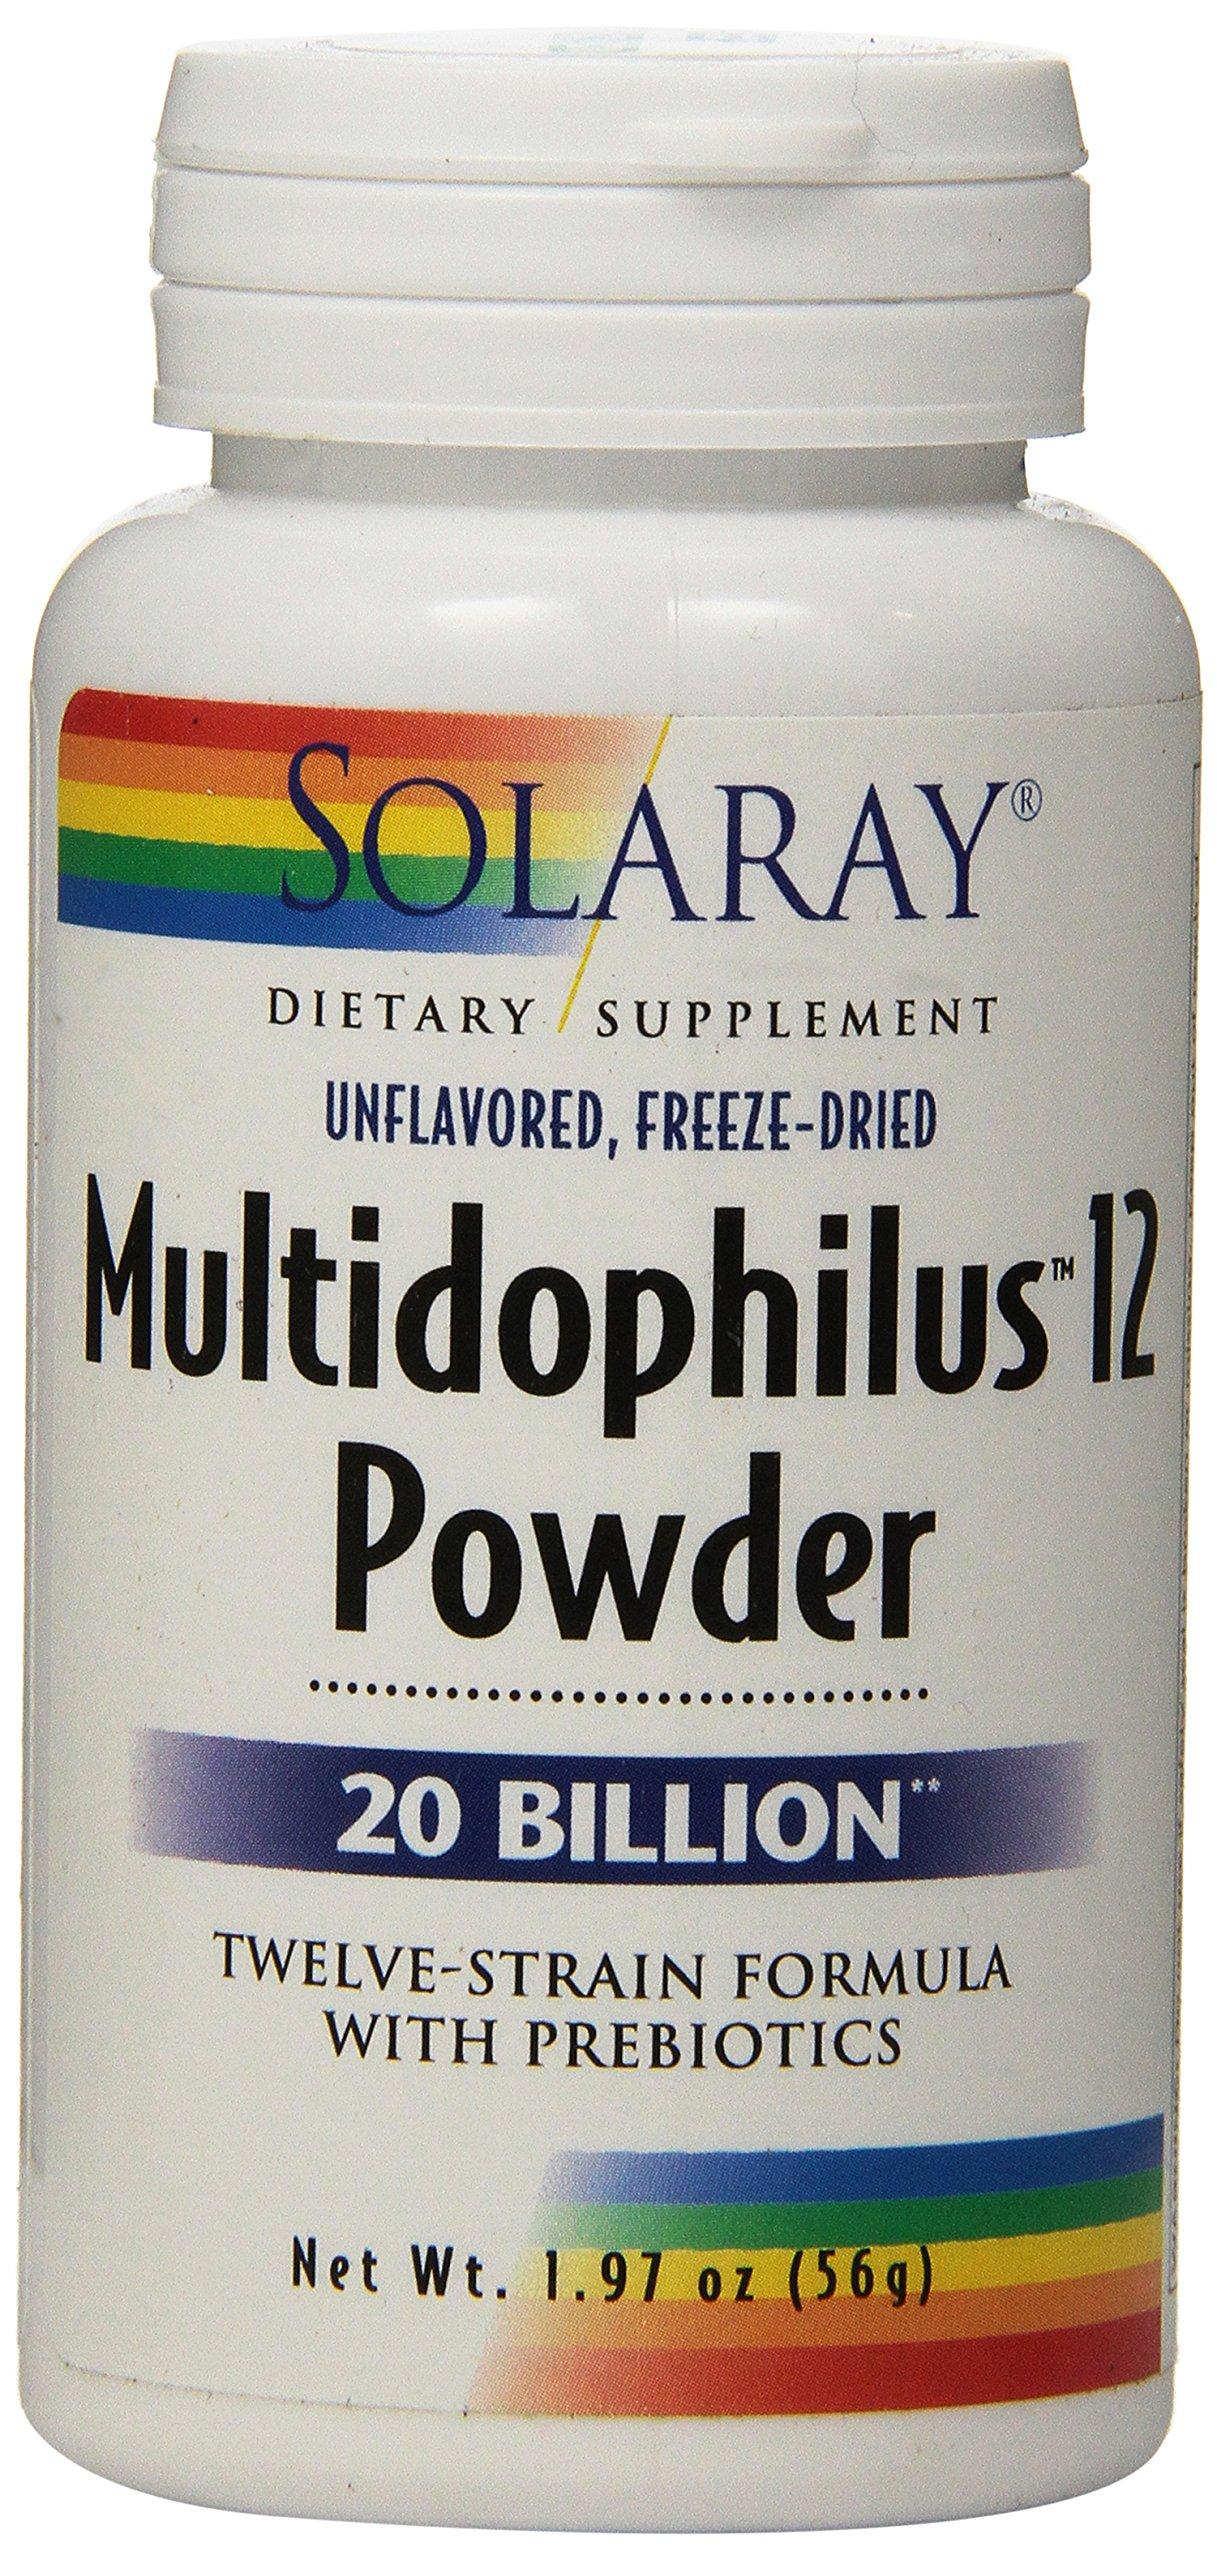 Solaray Multidophilus 12 Powder, 1.97 Ounce